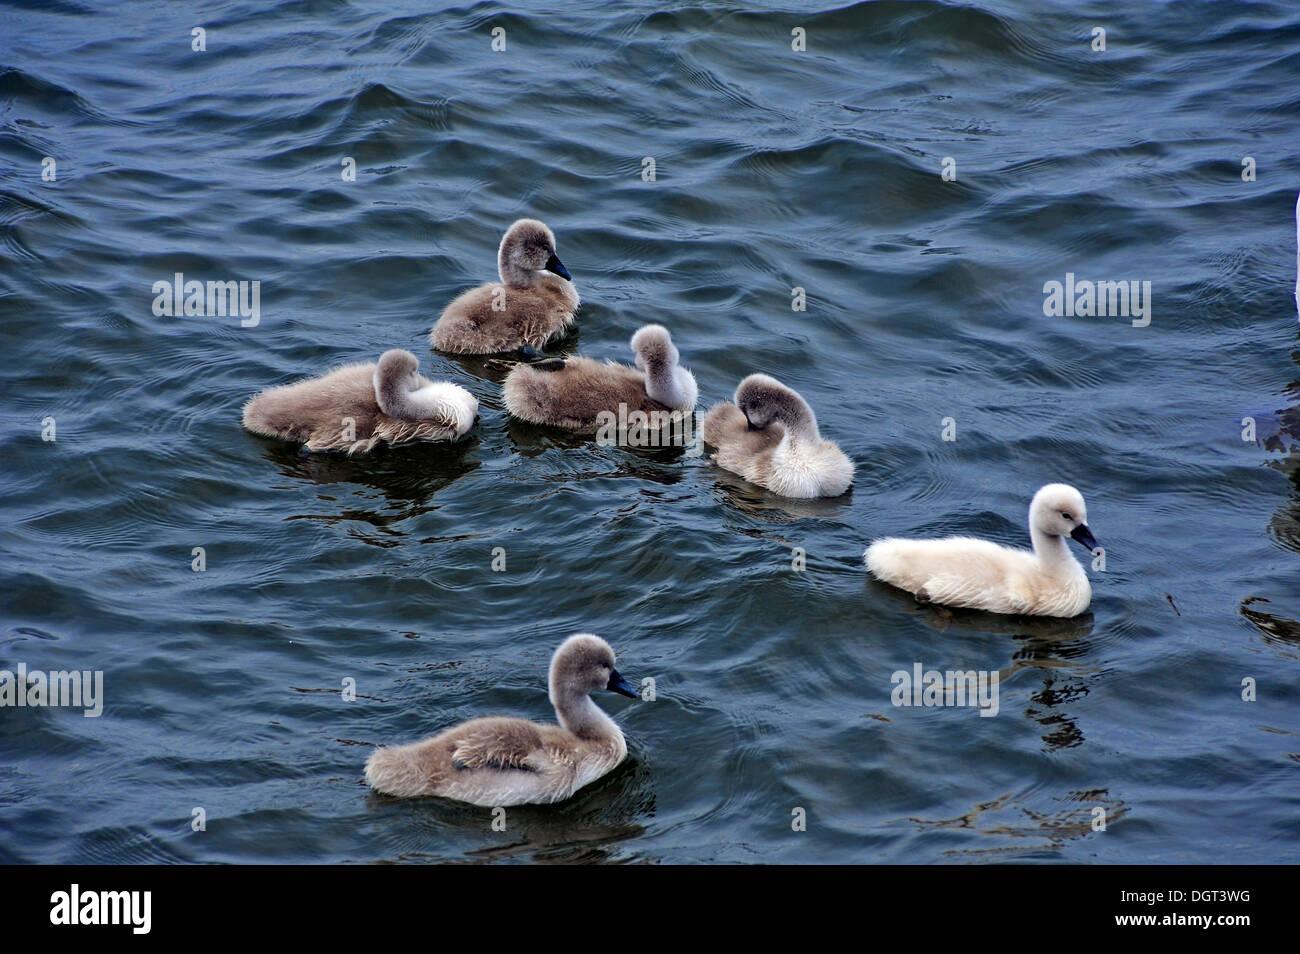 Mute swans (Cygnus olor), cygnets in the harbor, Seestrasse street, port, Stralsund, Mecklenburg-Western Pomerania Stock Photo